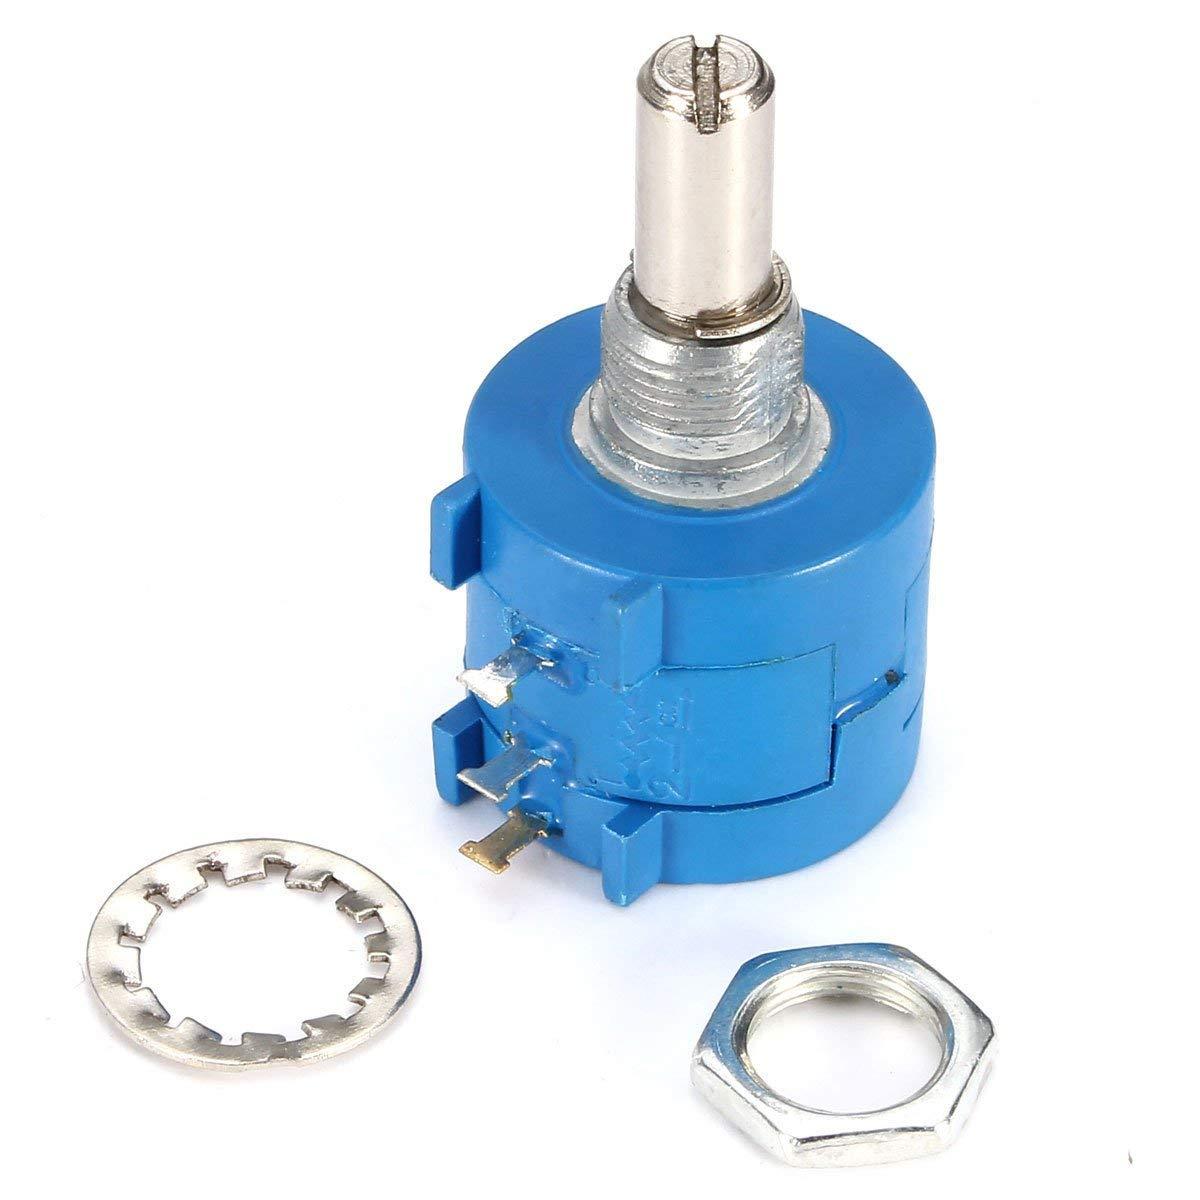 5PCS ~ BOURNS ~10K Ohm ~ Rotary Wirewound Precision Potentiometer ~ 3590S-2-103L